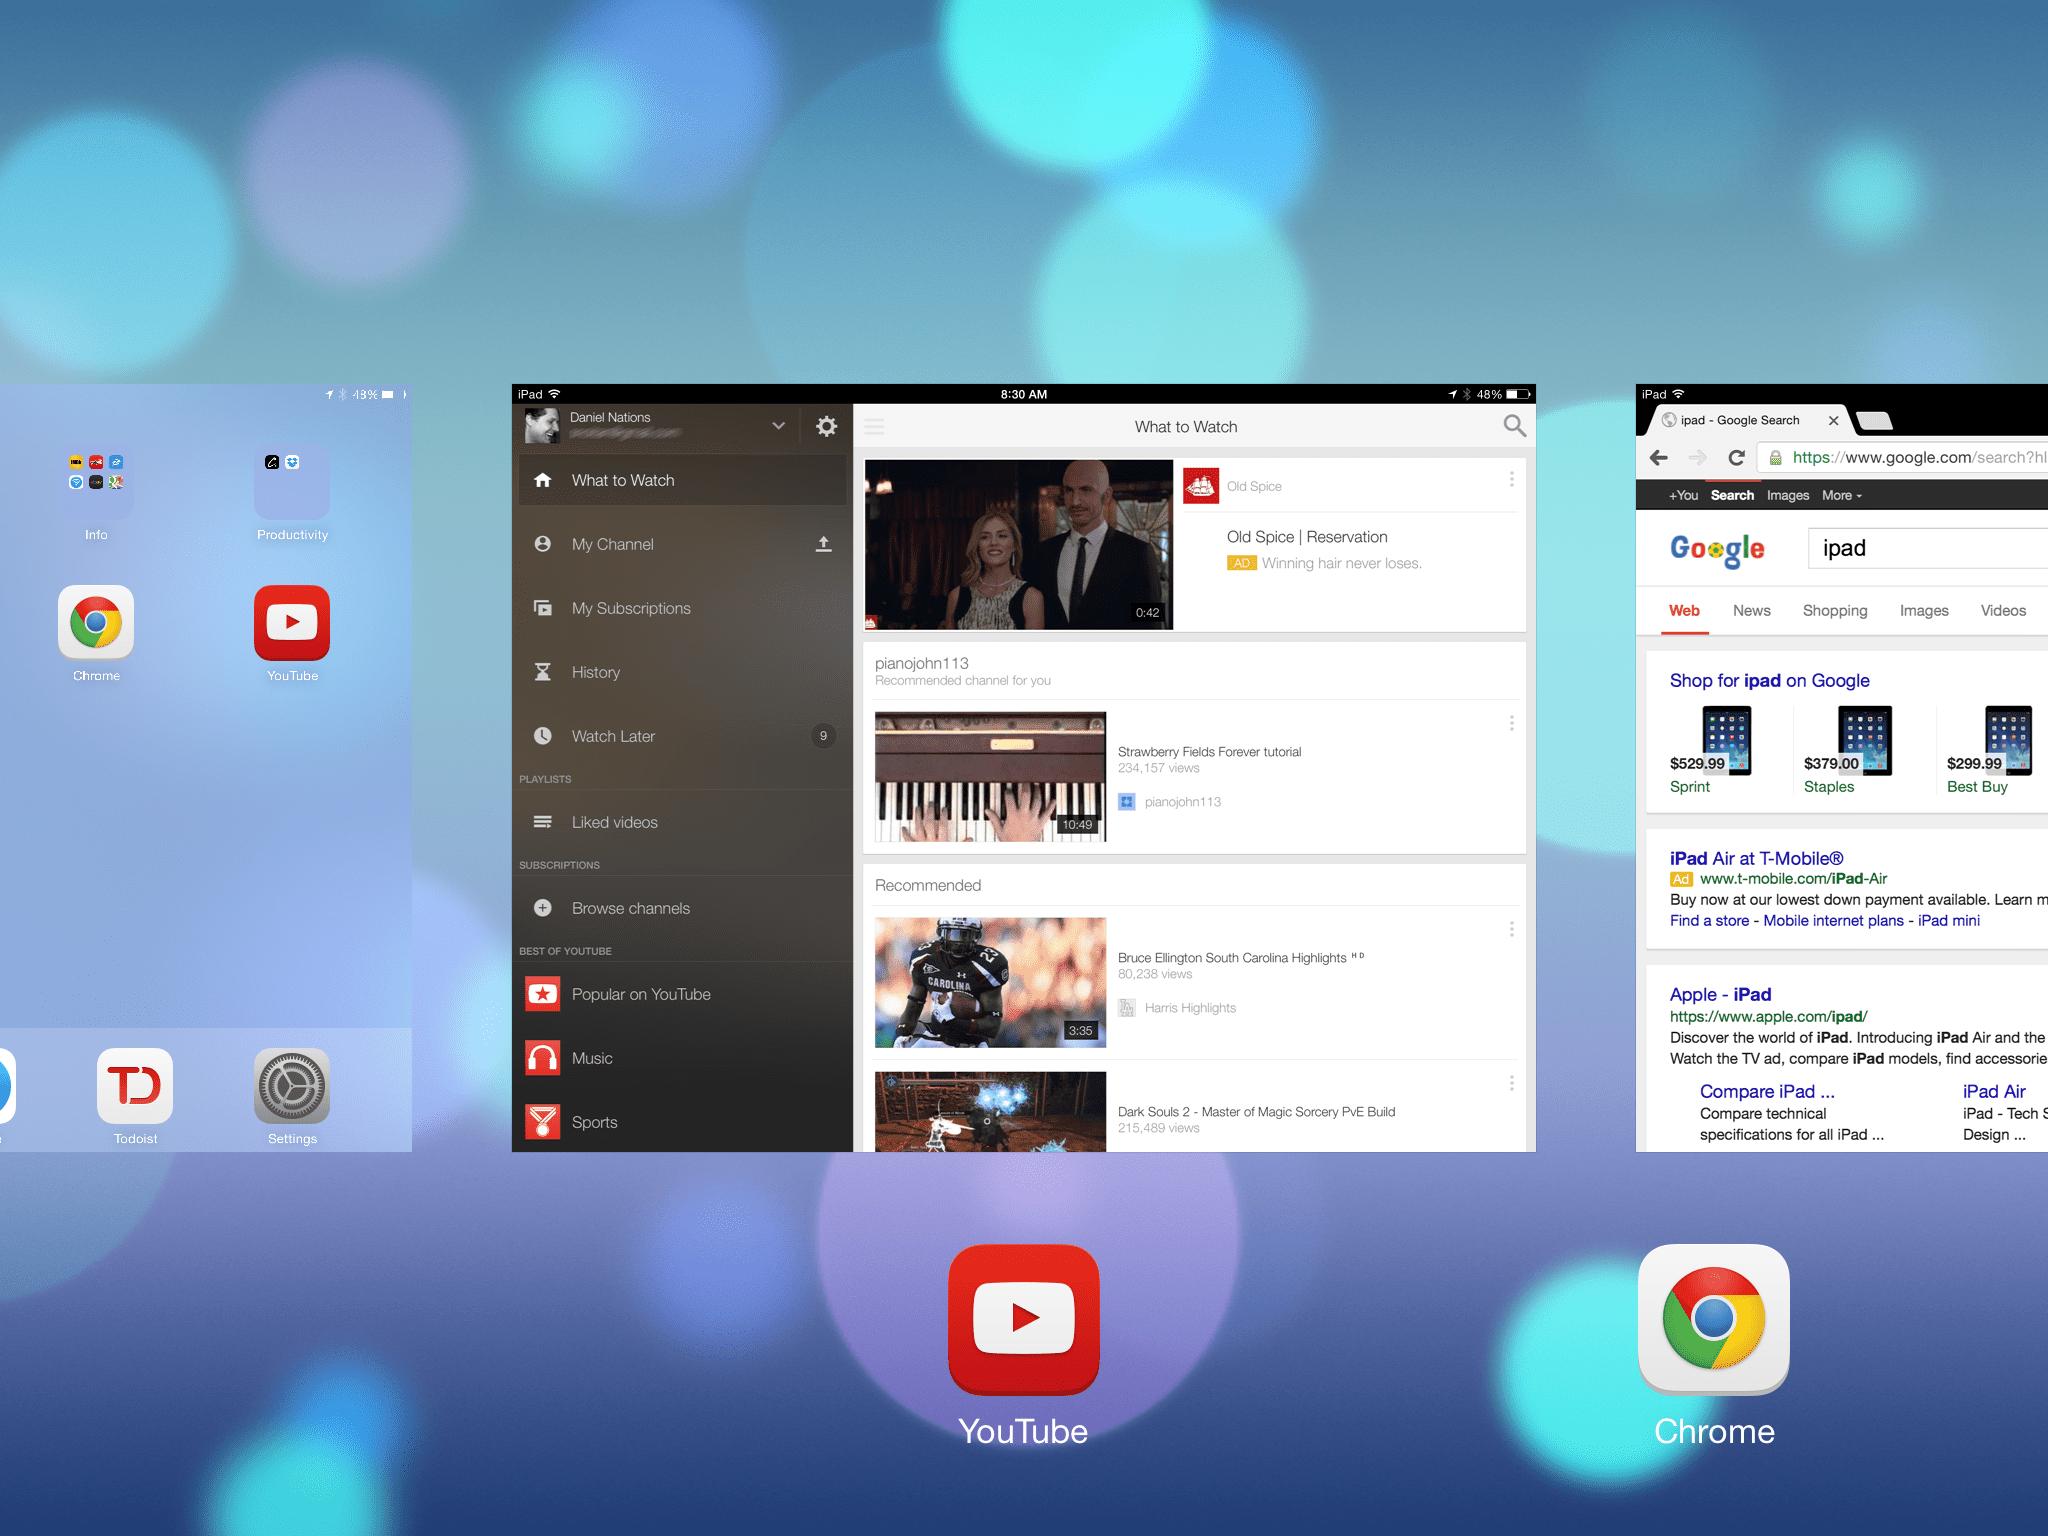 Multitasking on an iPad